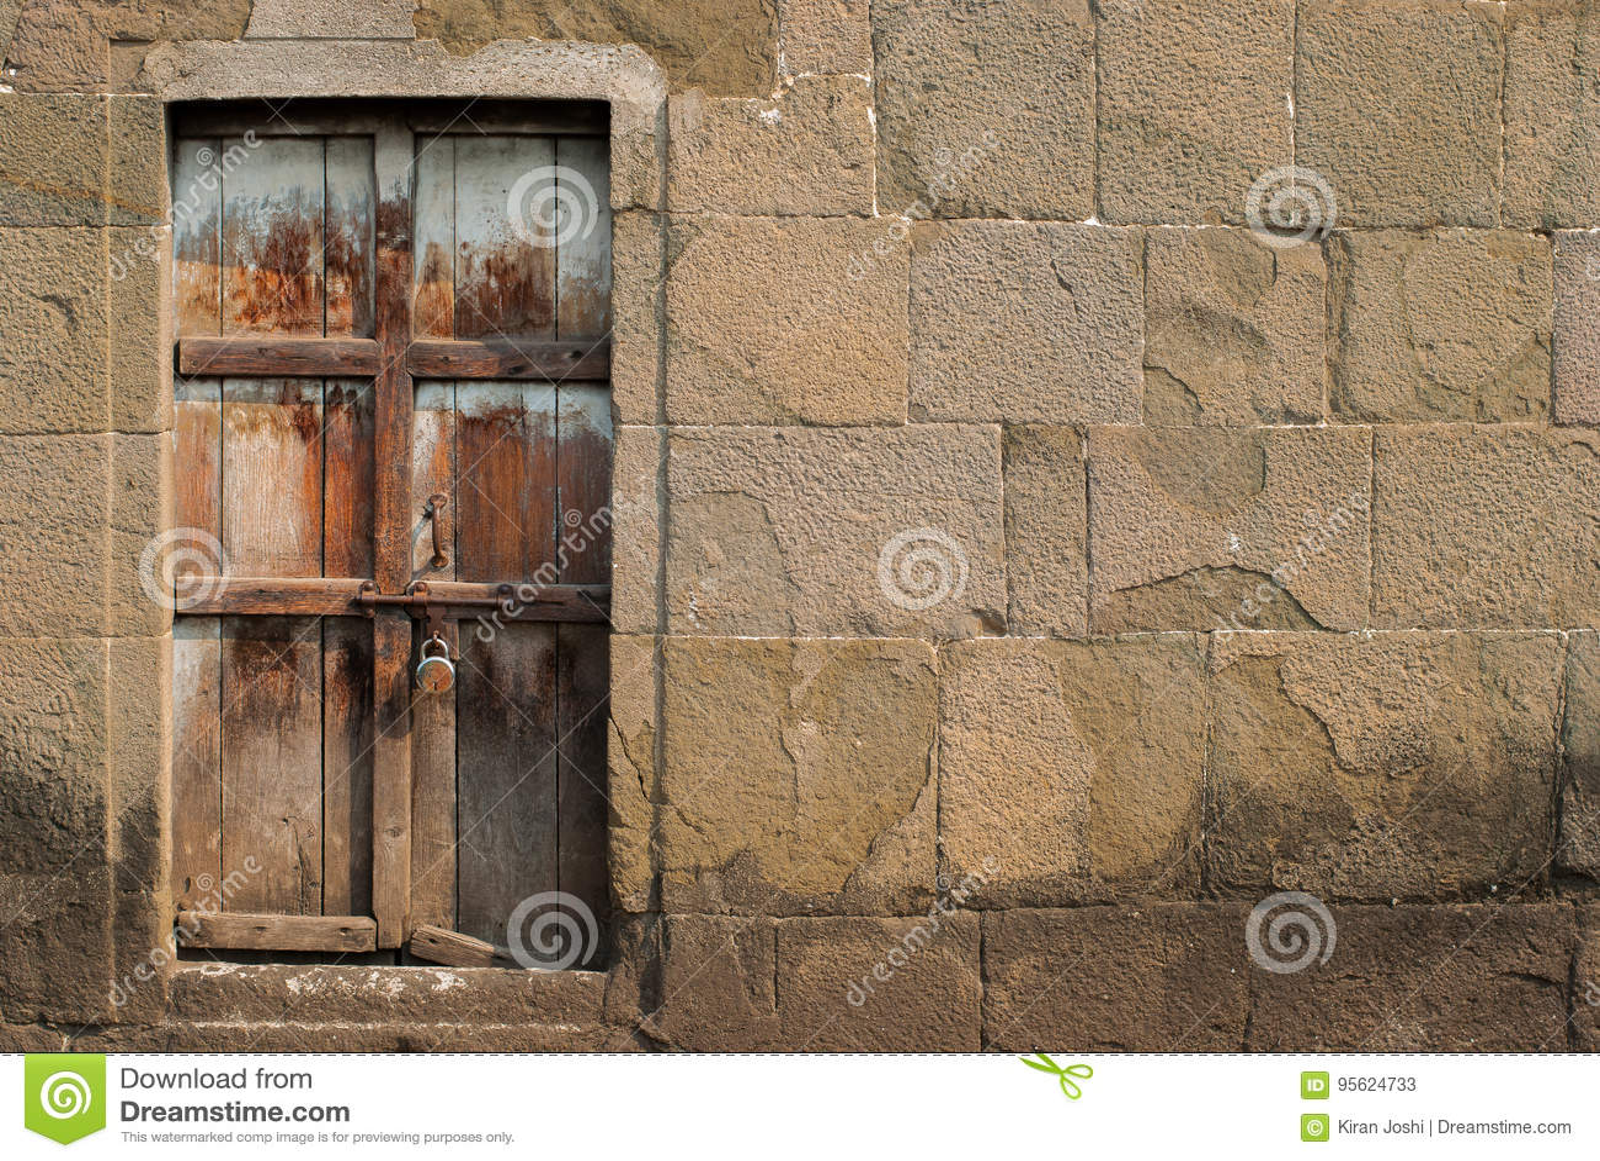 Verschlossene tür  Verschlossene Tür Stockfoto - Bild: 95624733